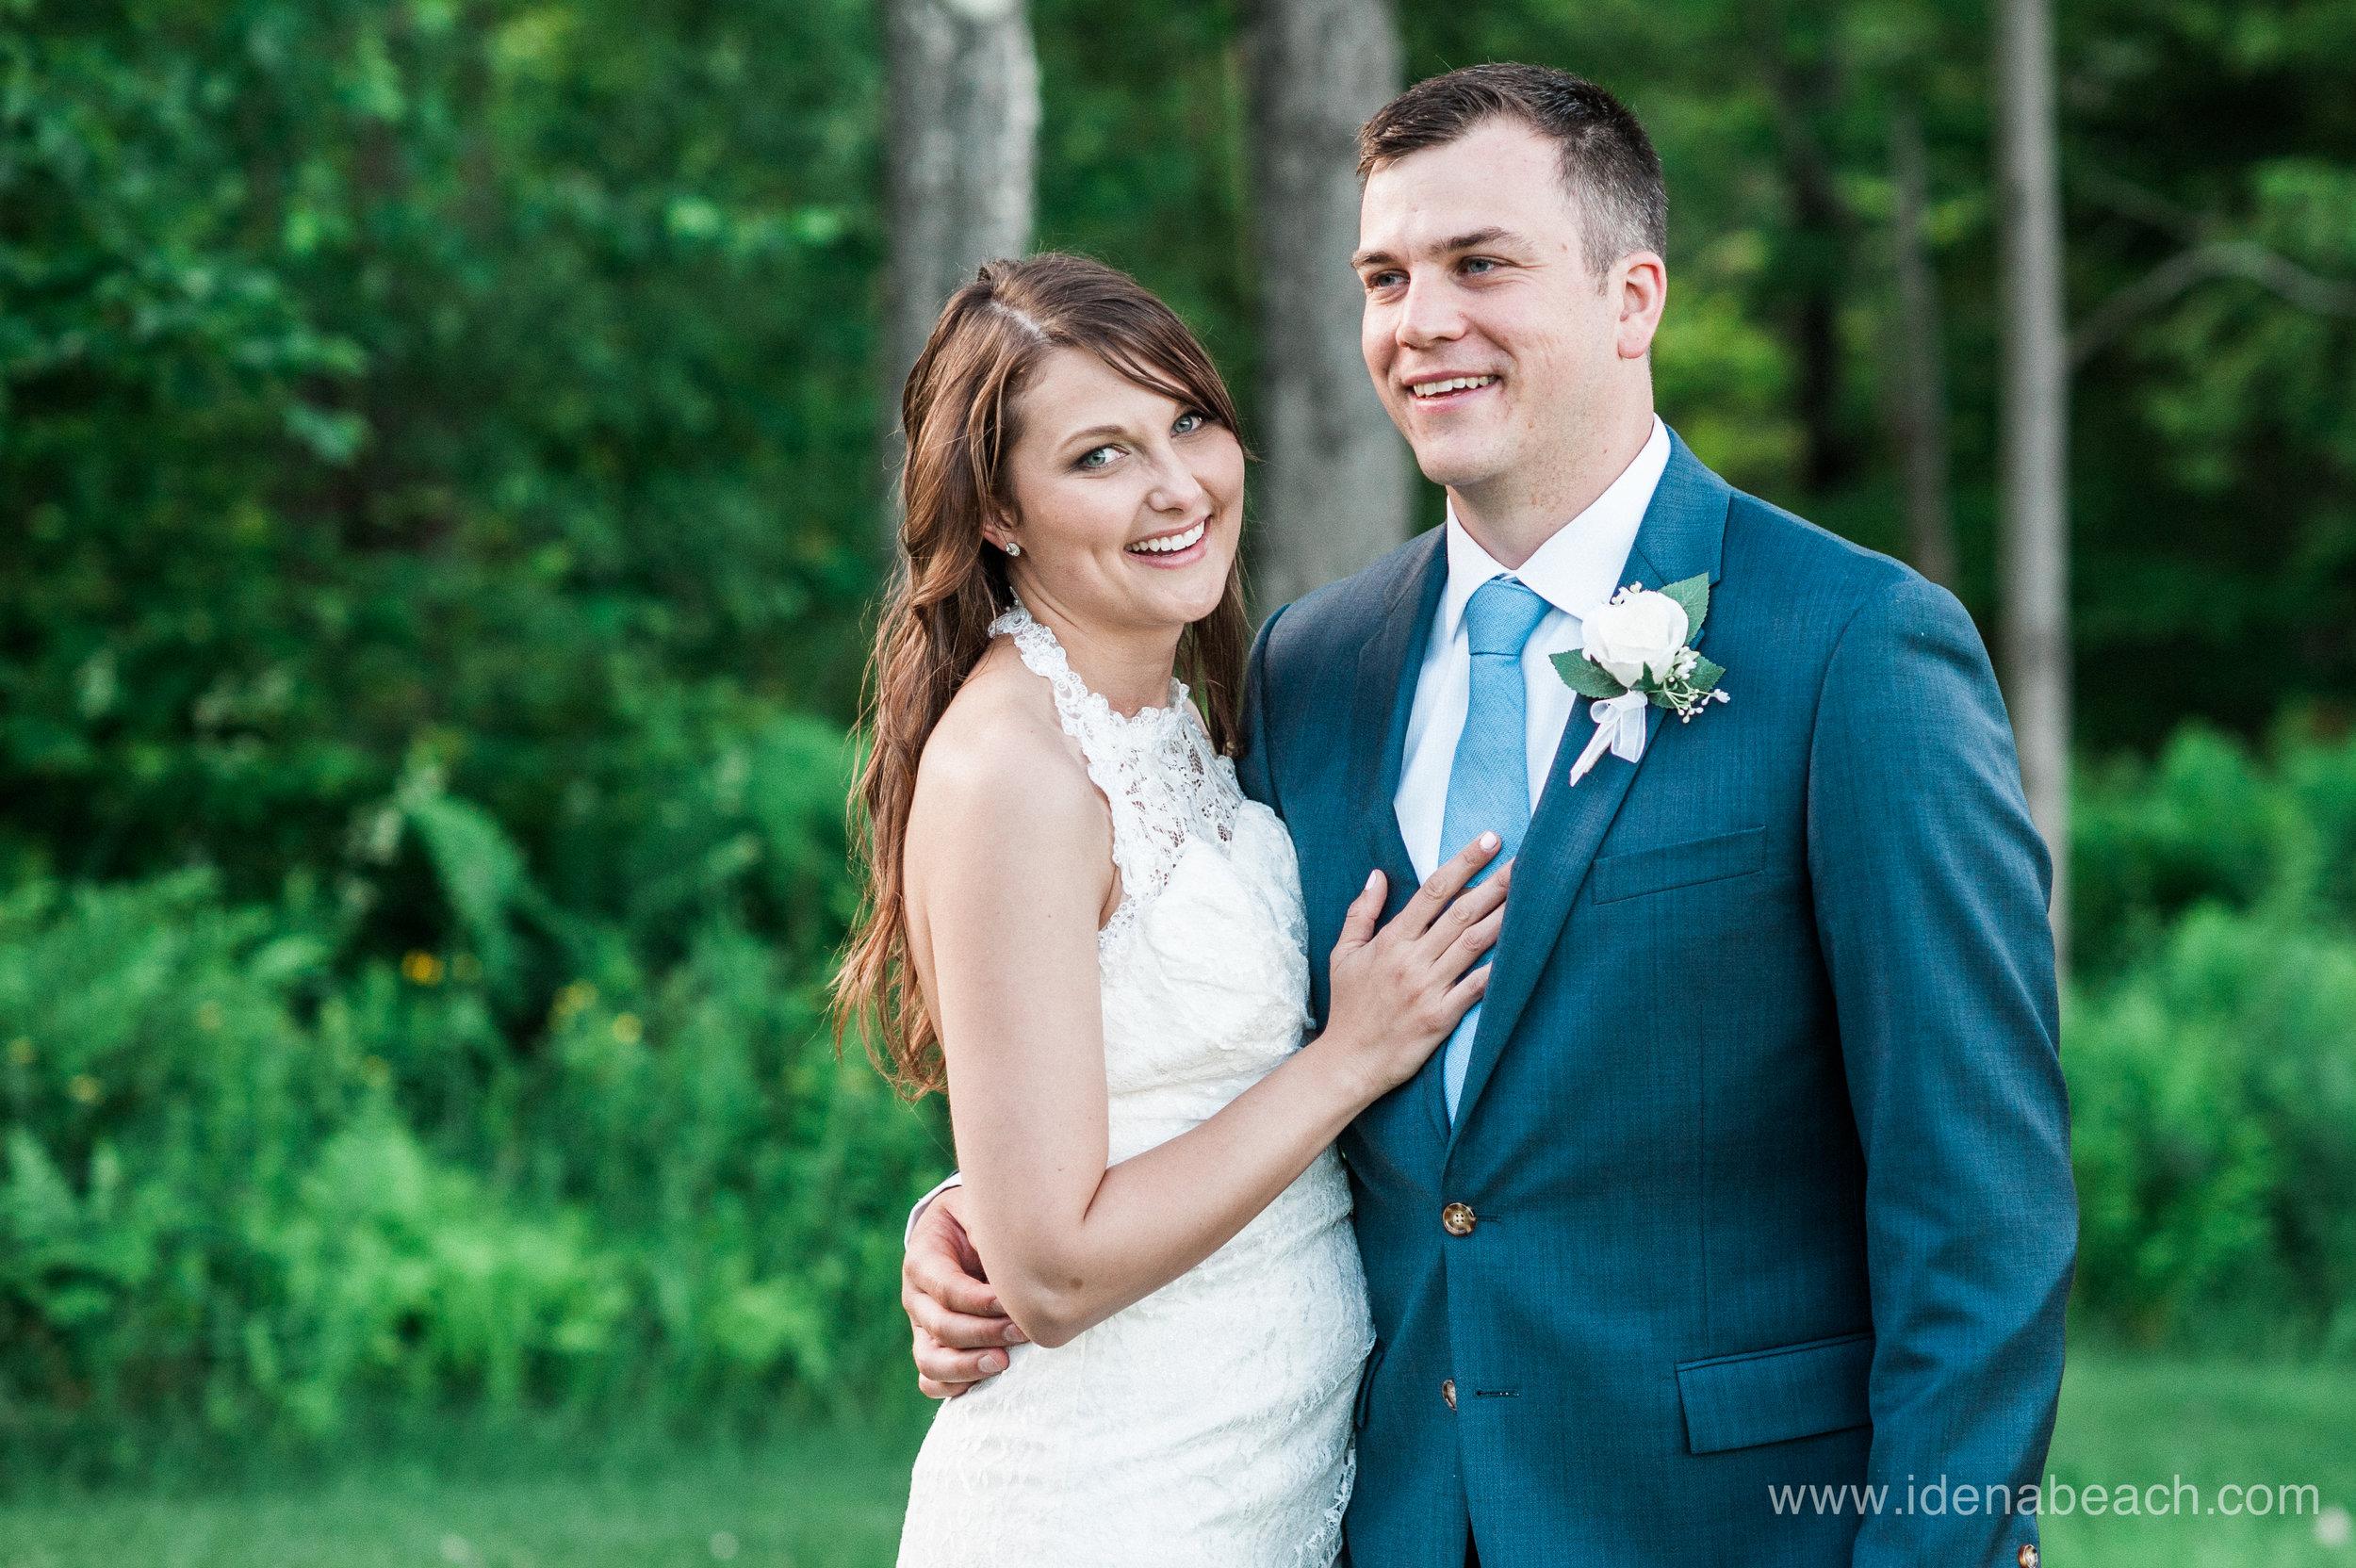 Mountain-Top-Inn-Vermont-Wedding-Photographer-148.jpg